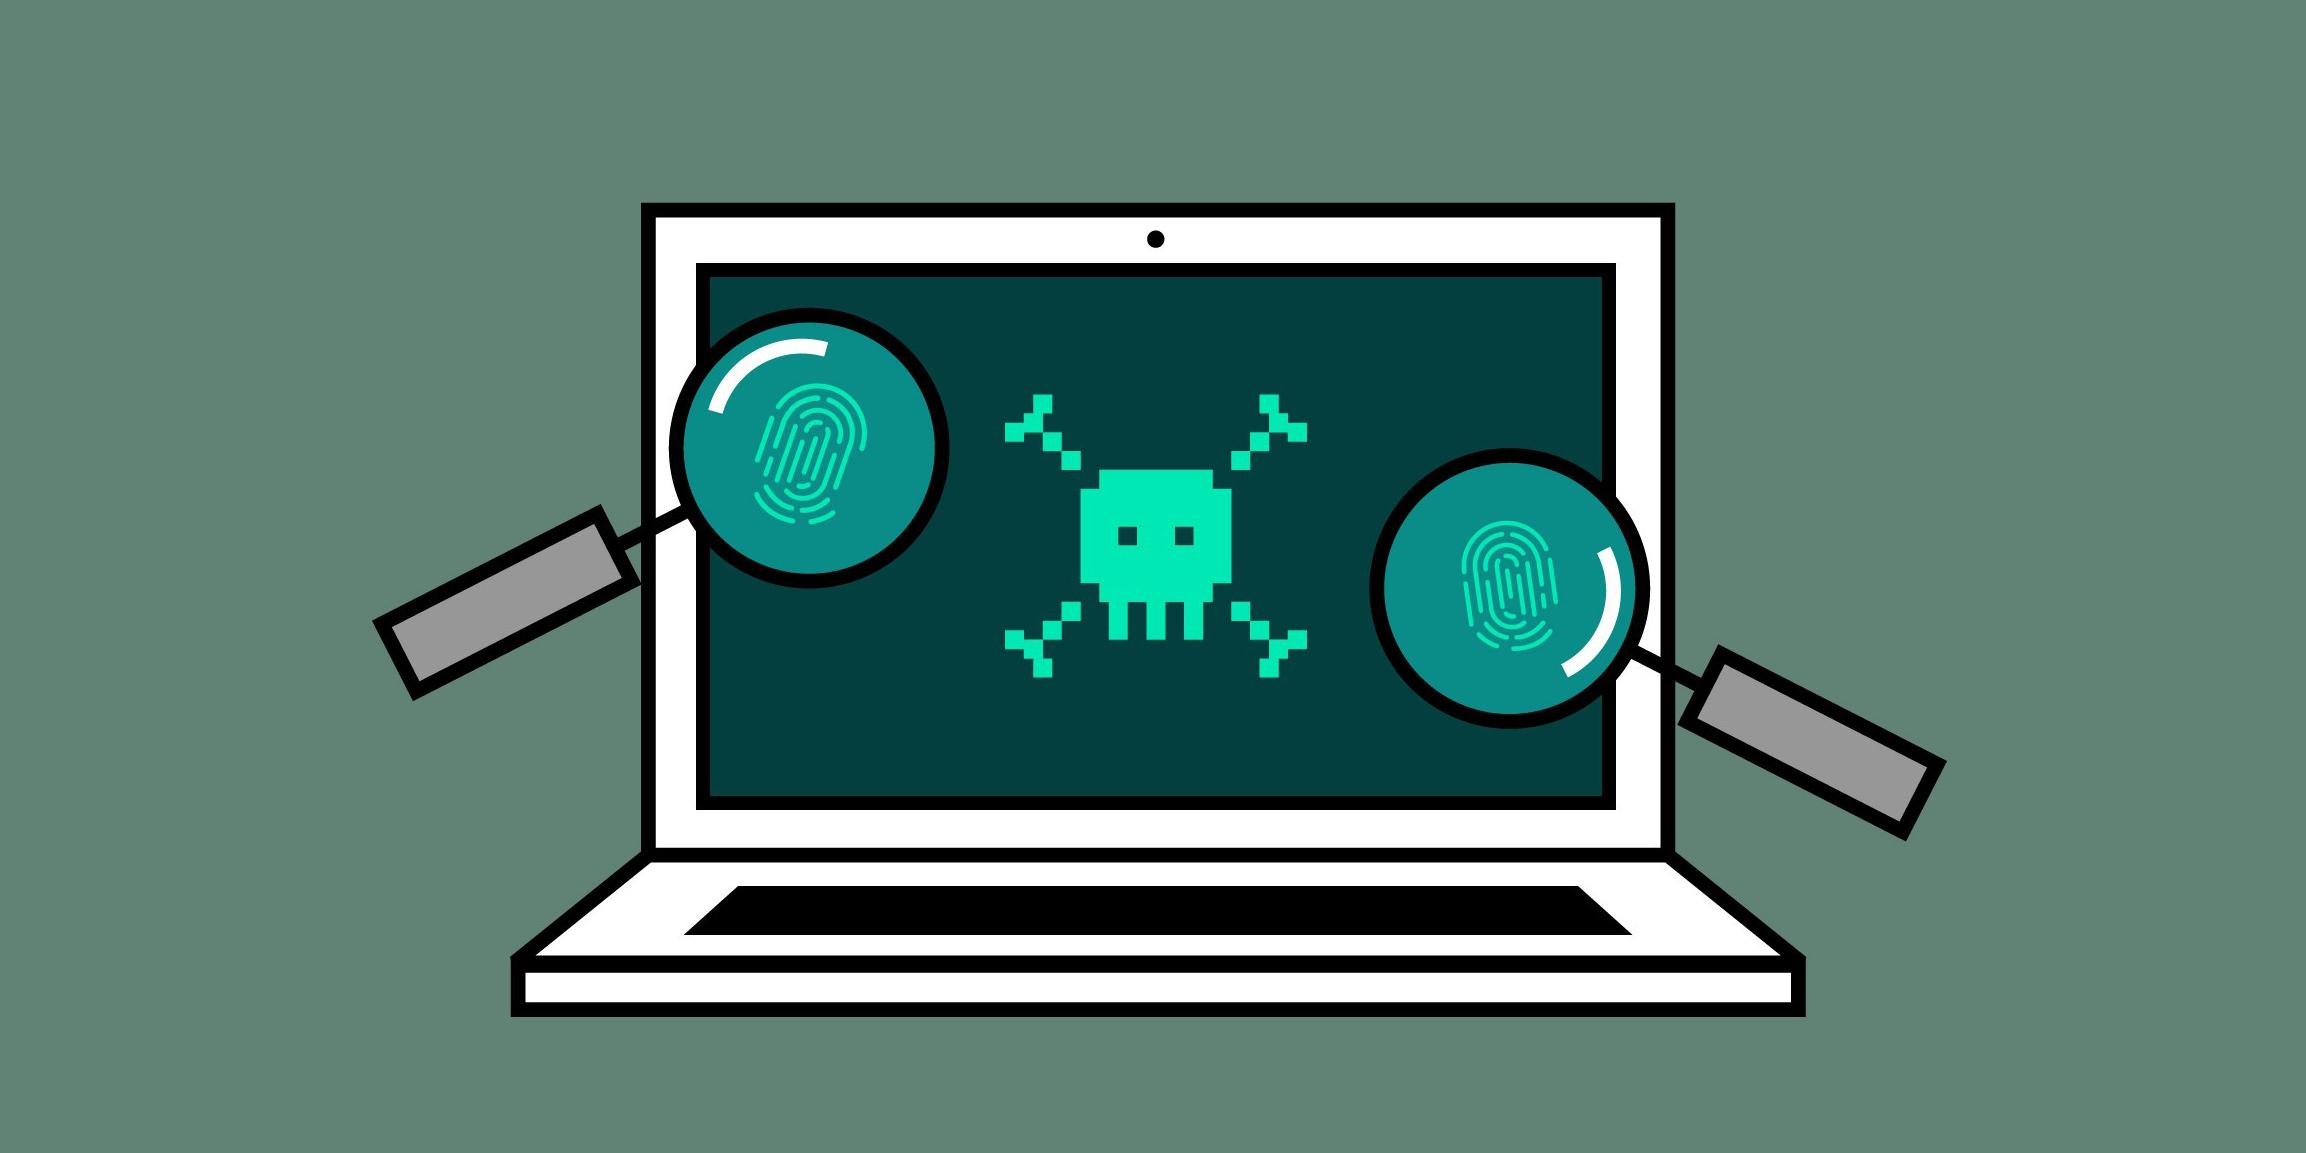 инструментов кибербезопасности